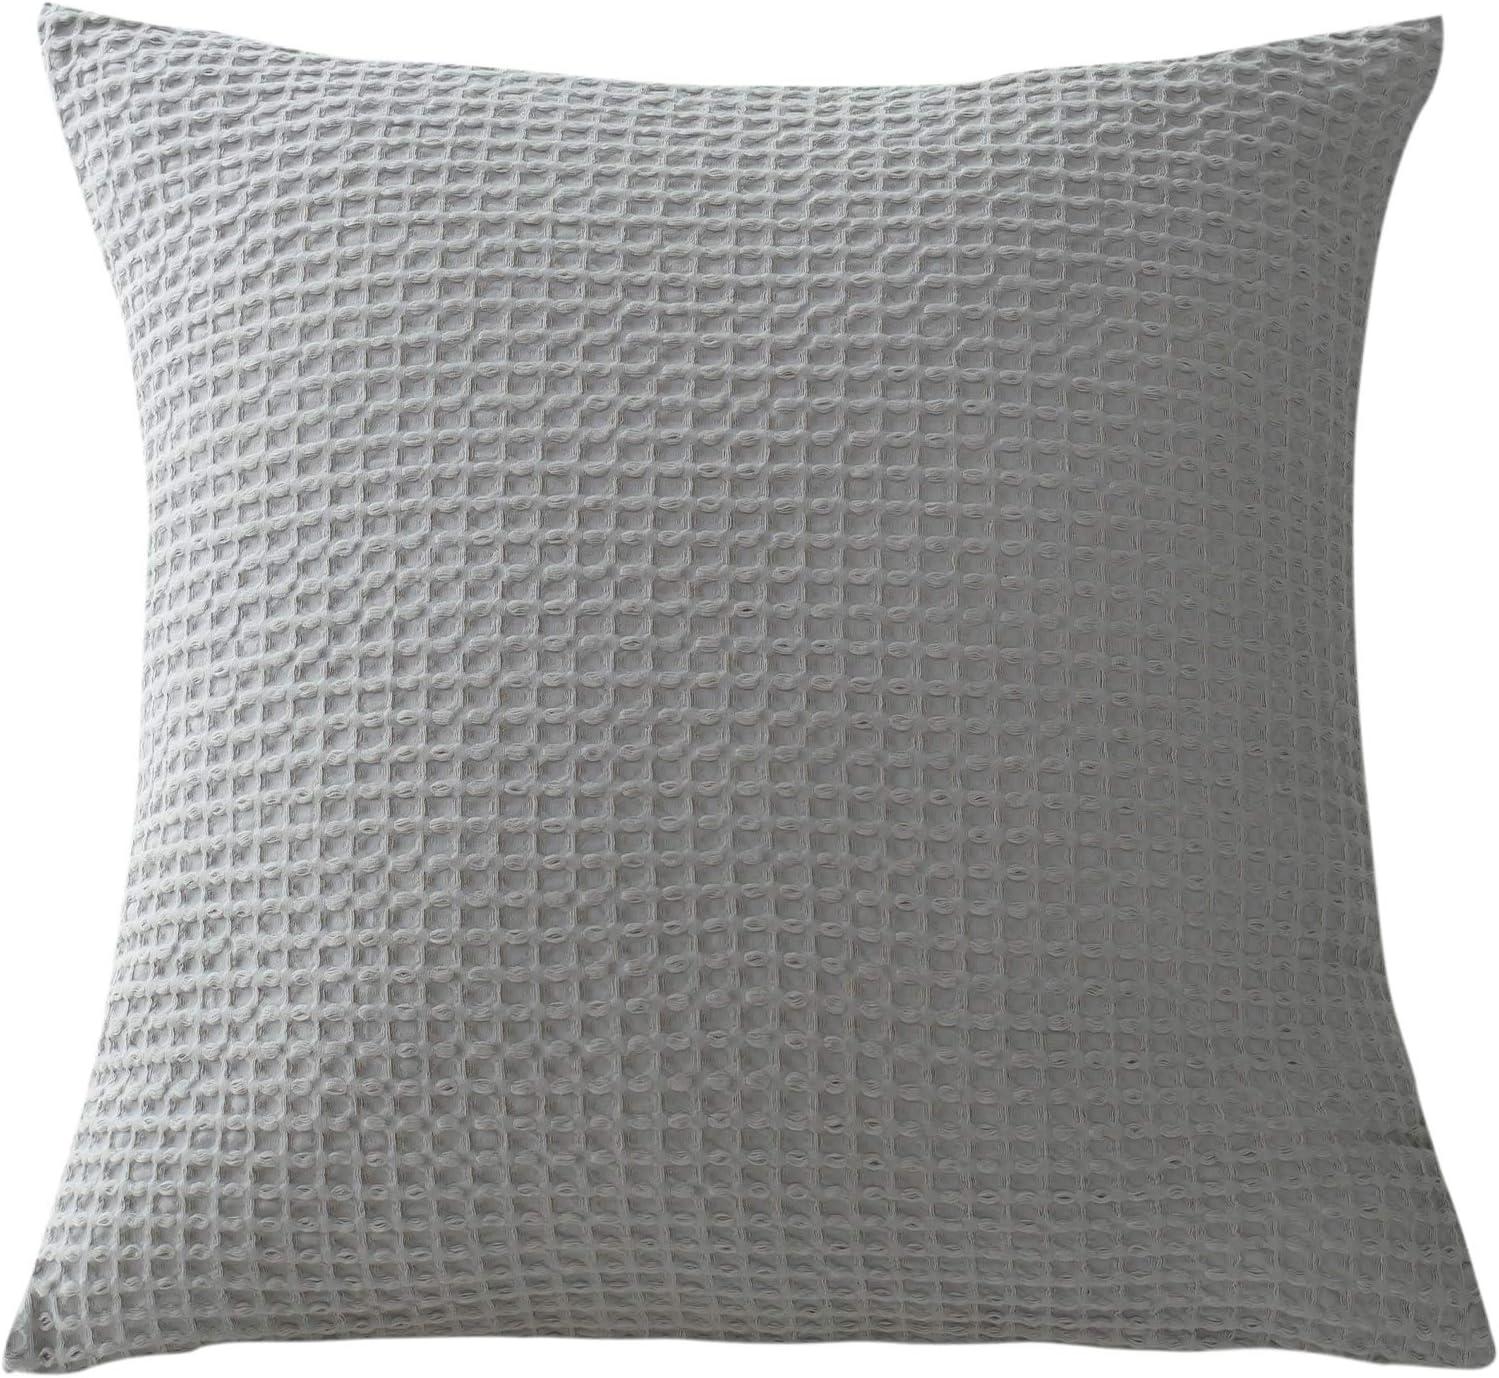 David's Home Waffle Euro Sham Pack of 2 Cotton Pillow Covers Overlap Closure Design Decorative Pillowcase for Sofa Bedroom Car Home 26